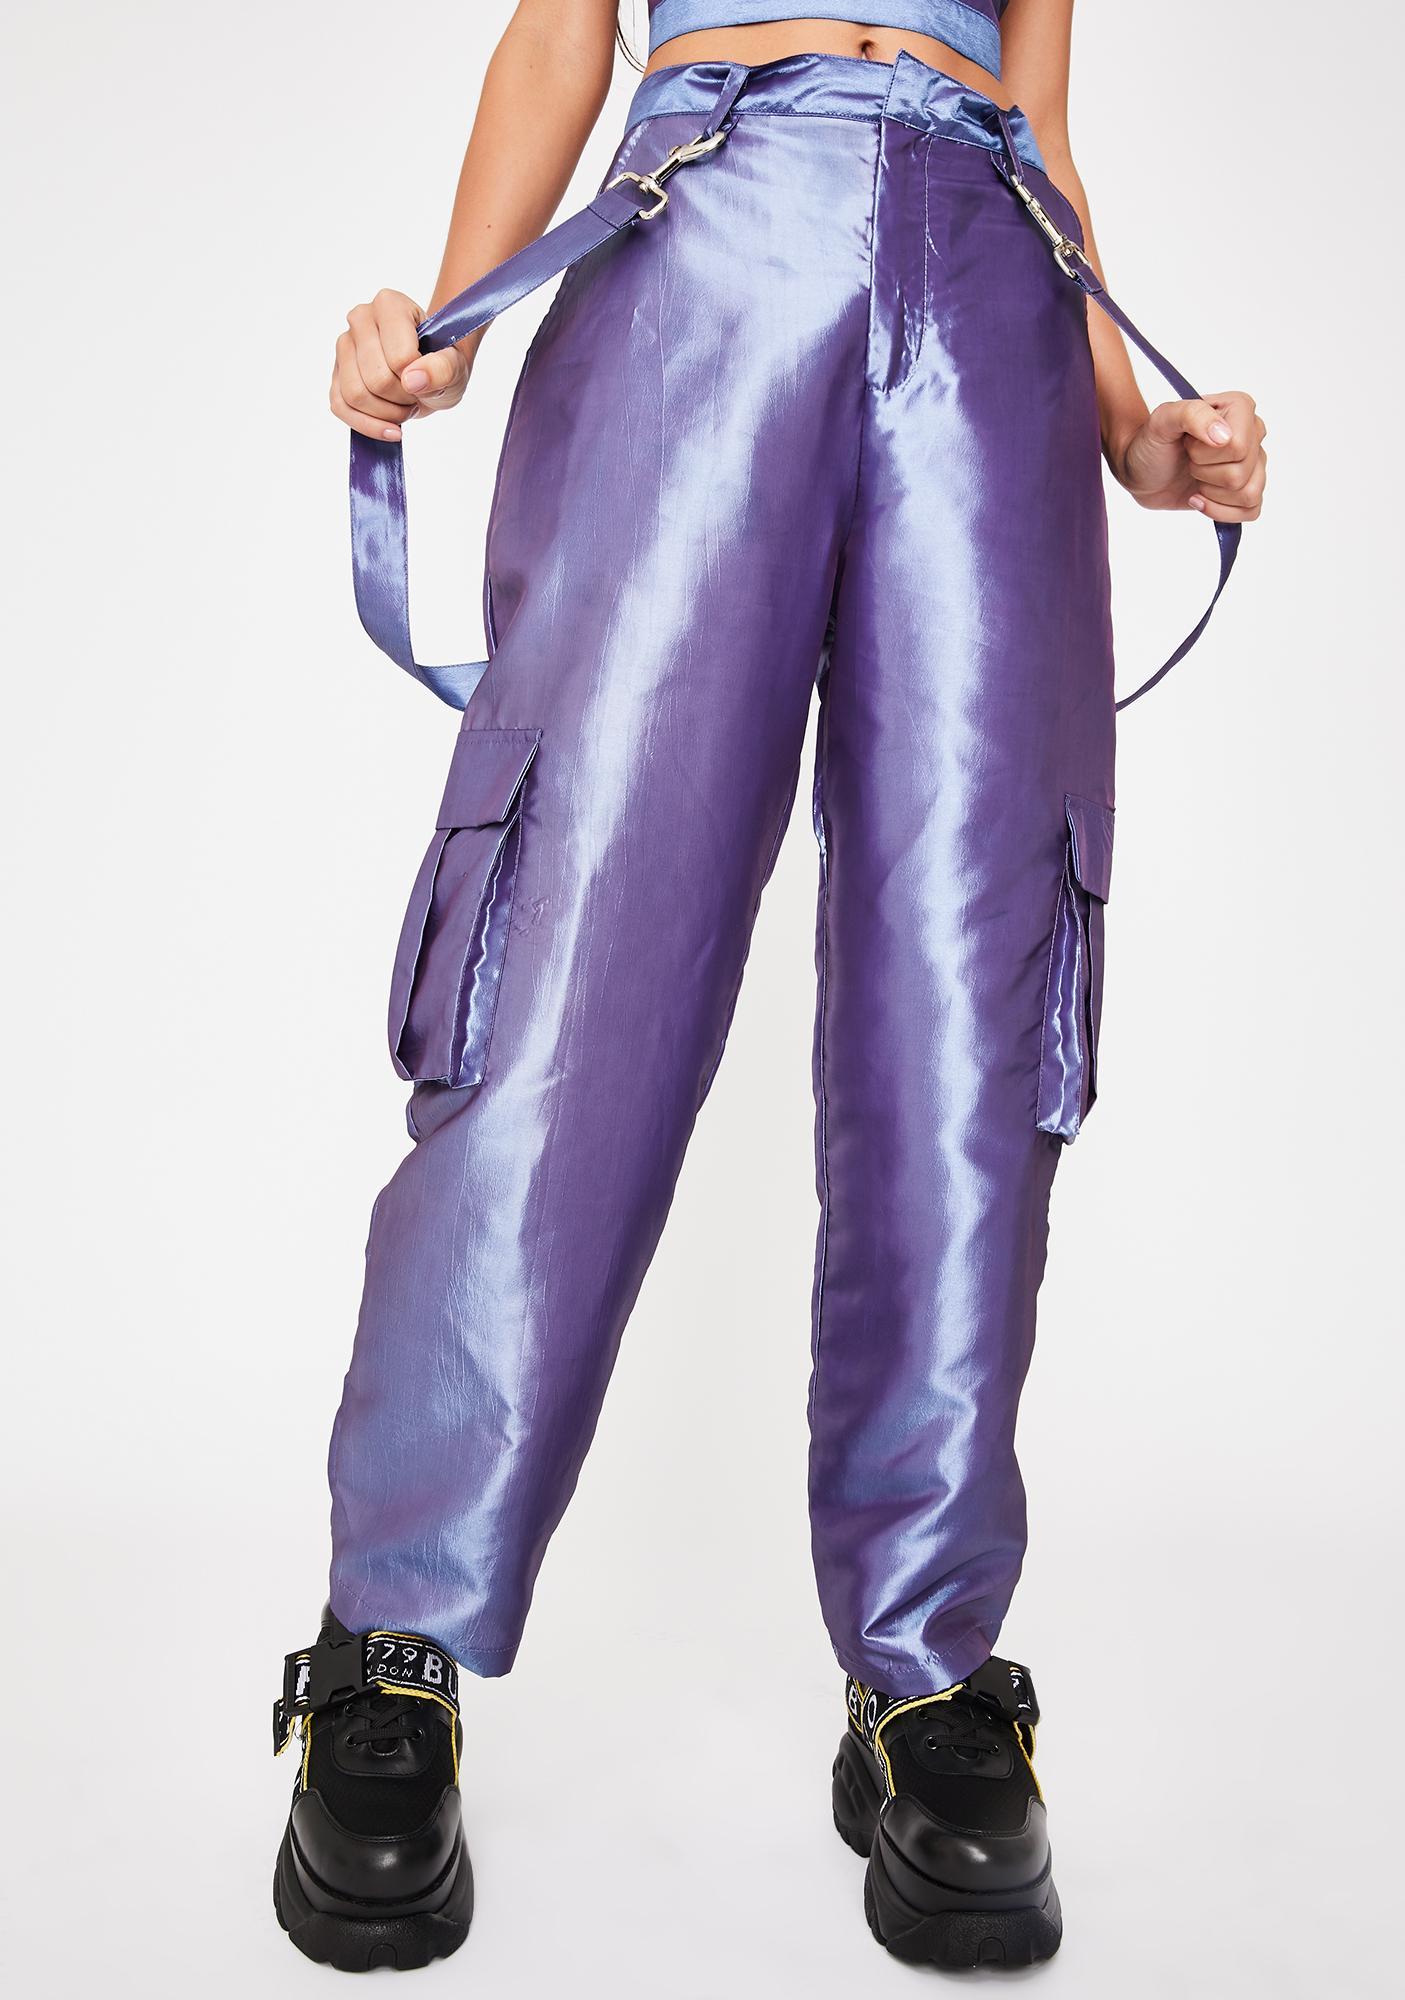 The Ragged Priest Glitch Metallic Cargo Pants